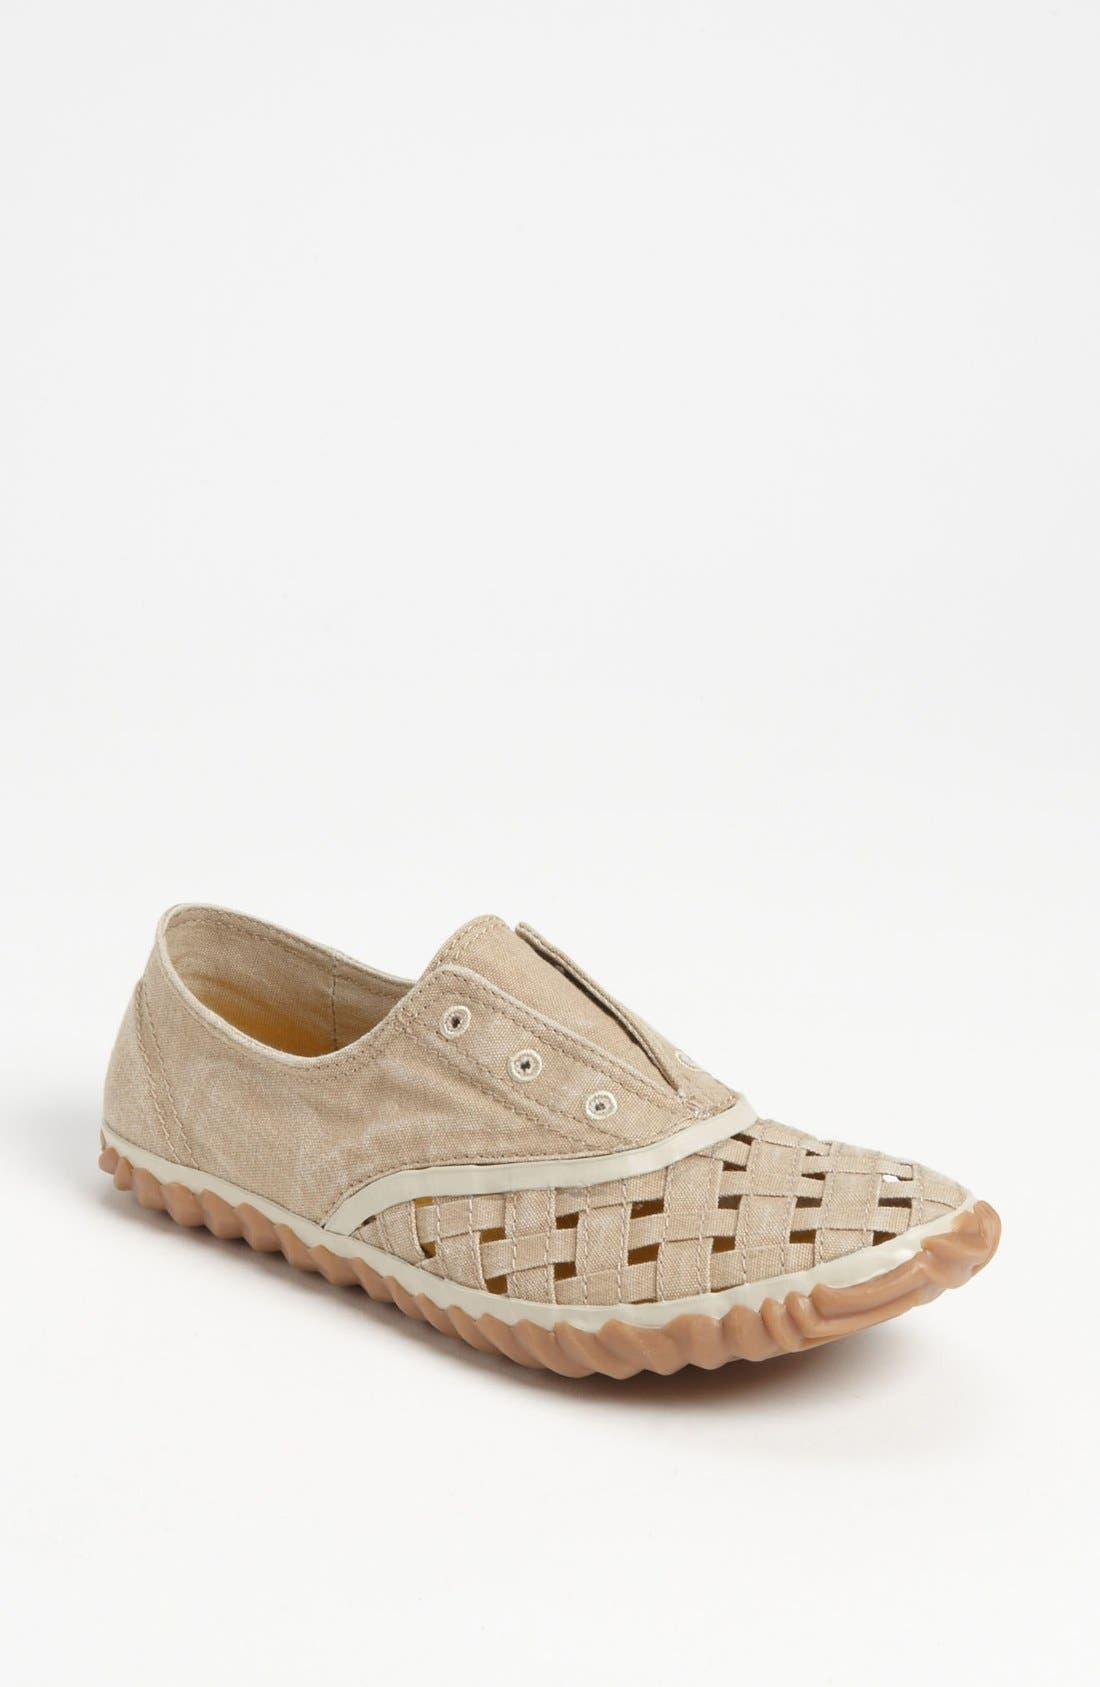 Alternate Image 1 Selected - Sorel 'Picnic Weave Plimsole™' Sneaker